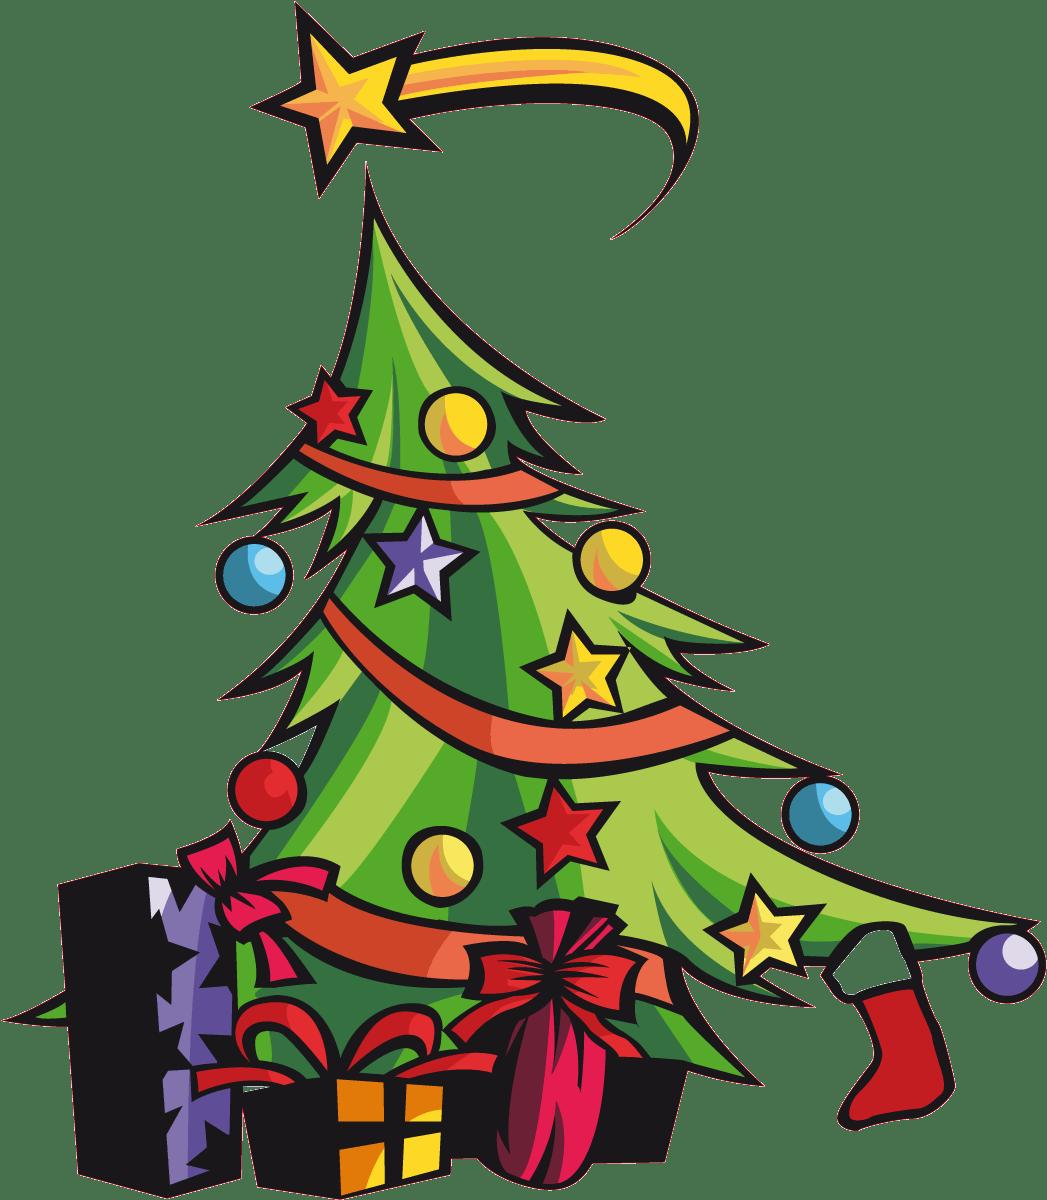 Wandtattoos: Christmas tree